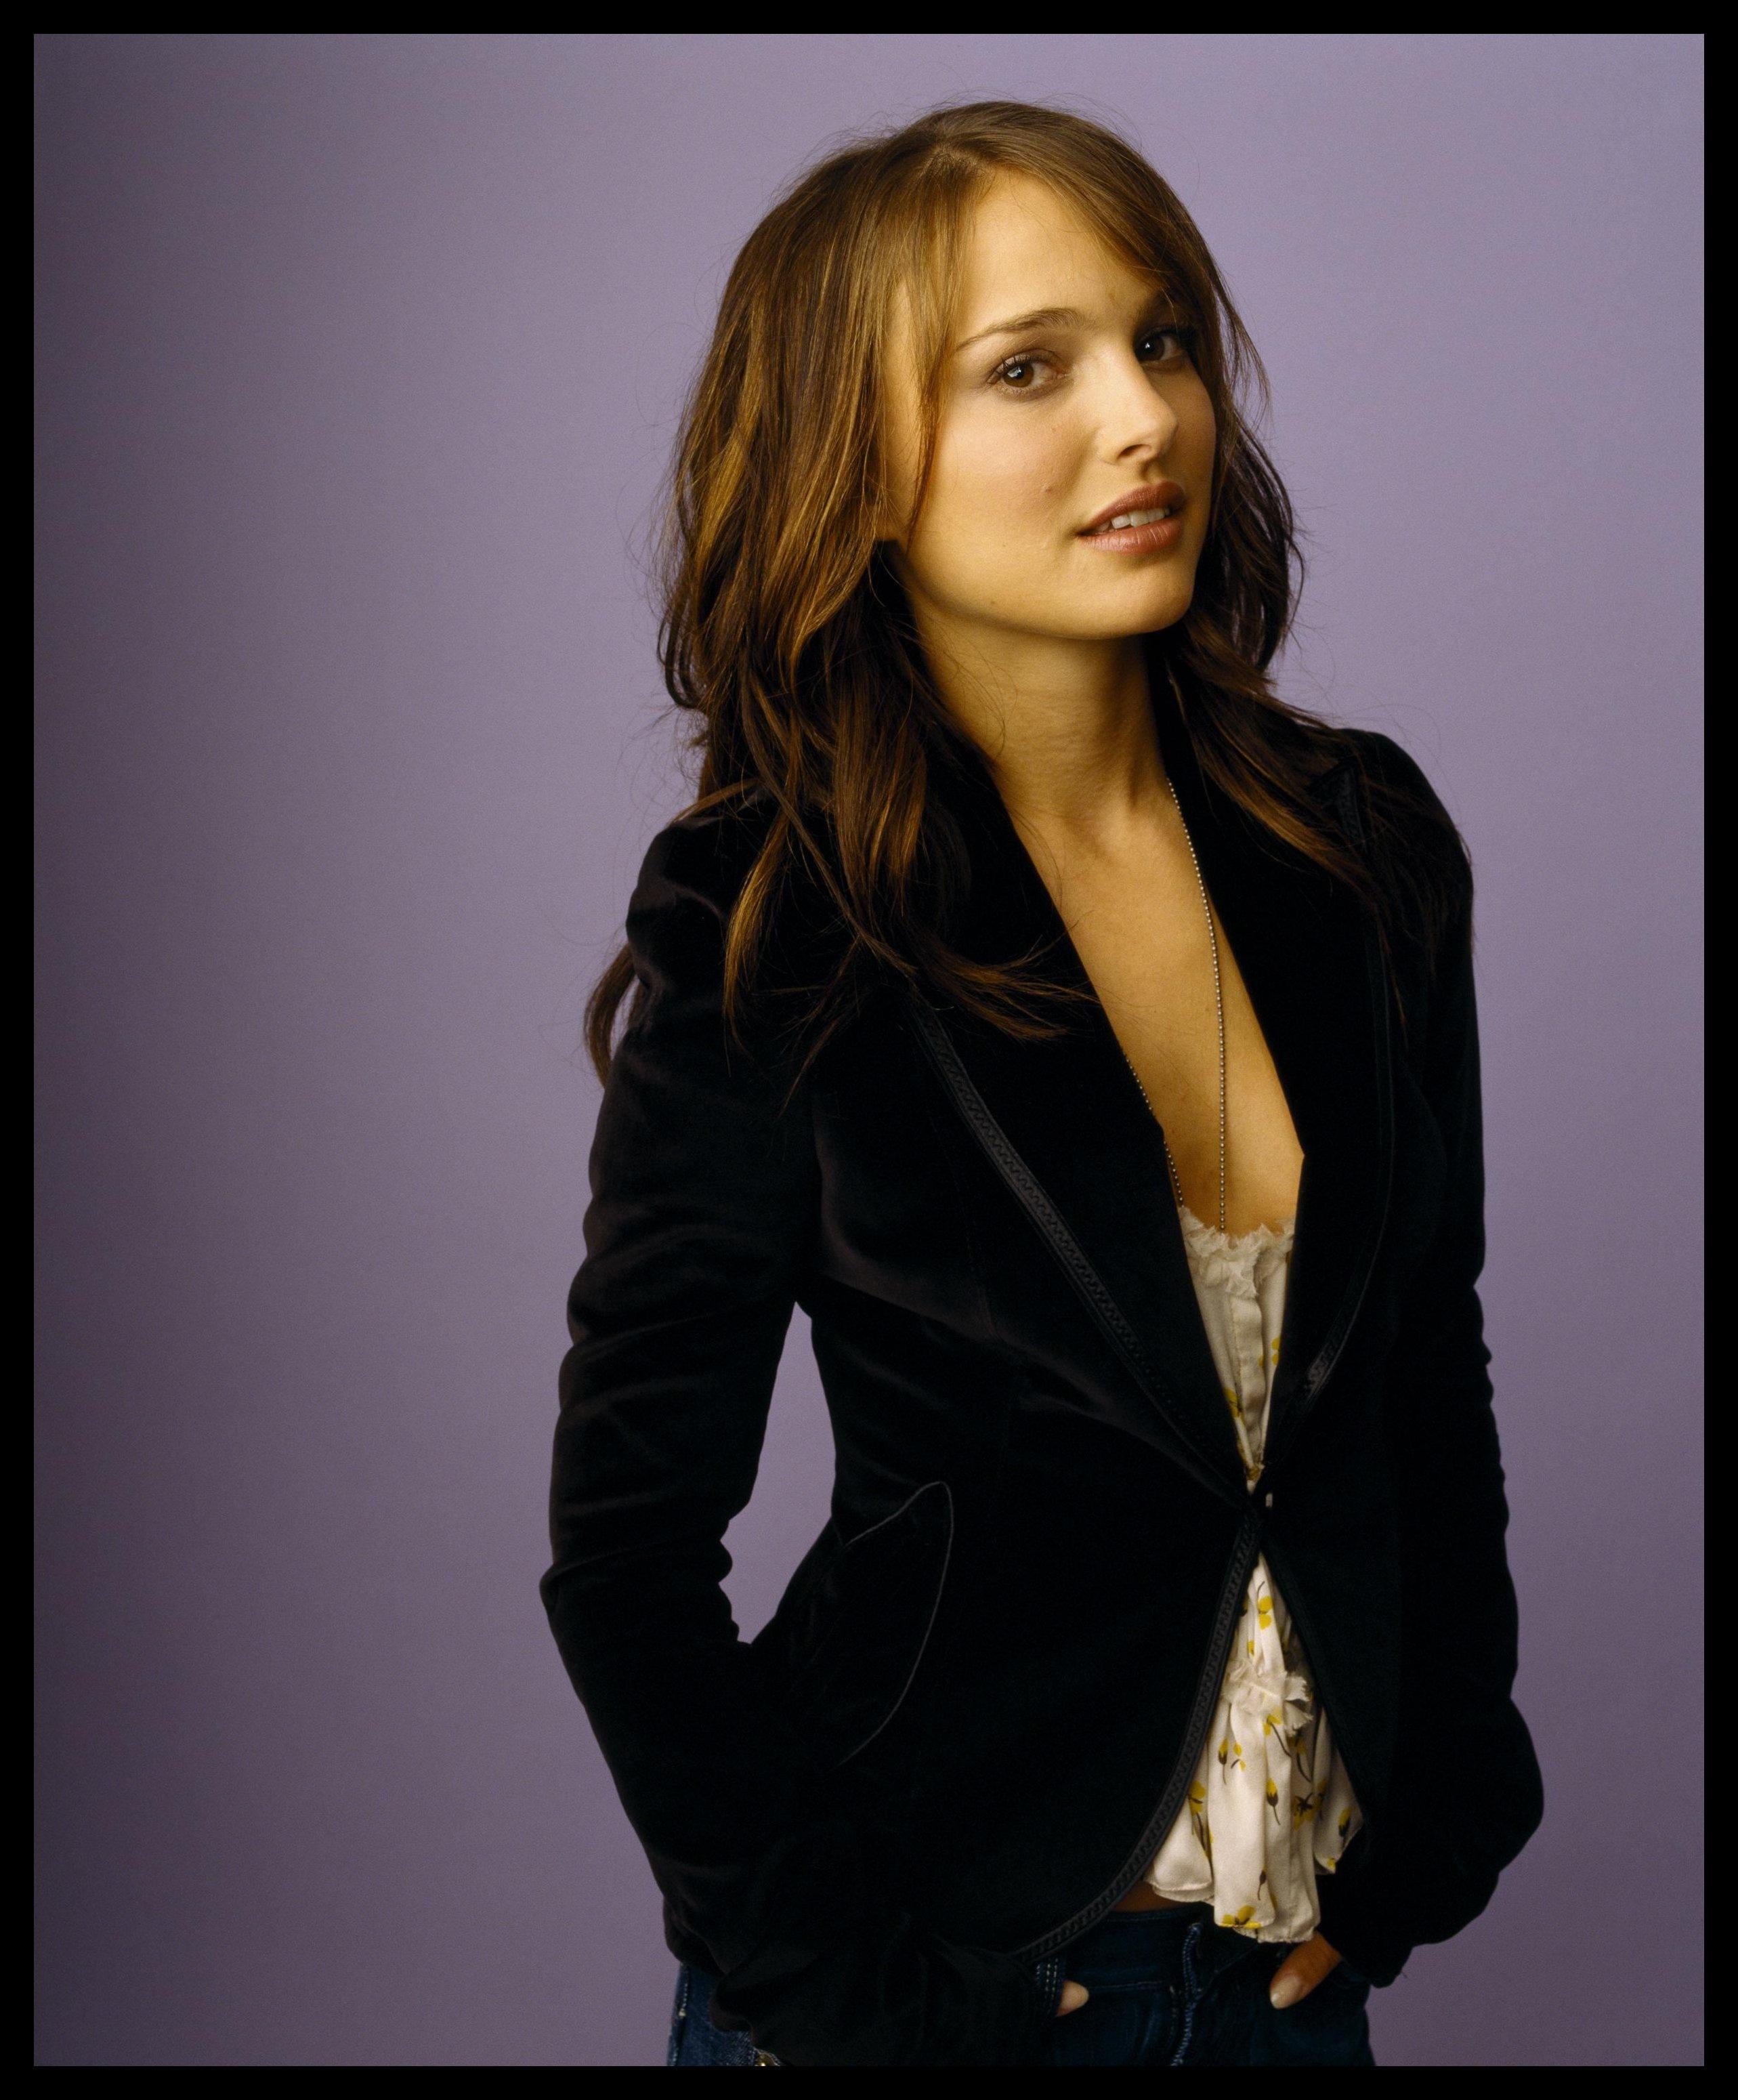 Натали Портман - Natalie Portman фото №70507 Natalie Portman